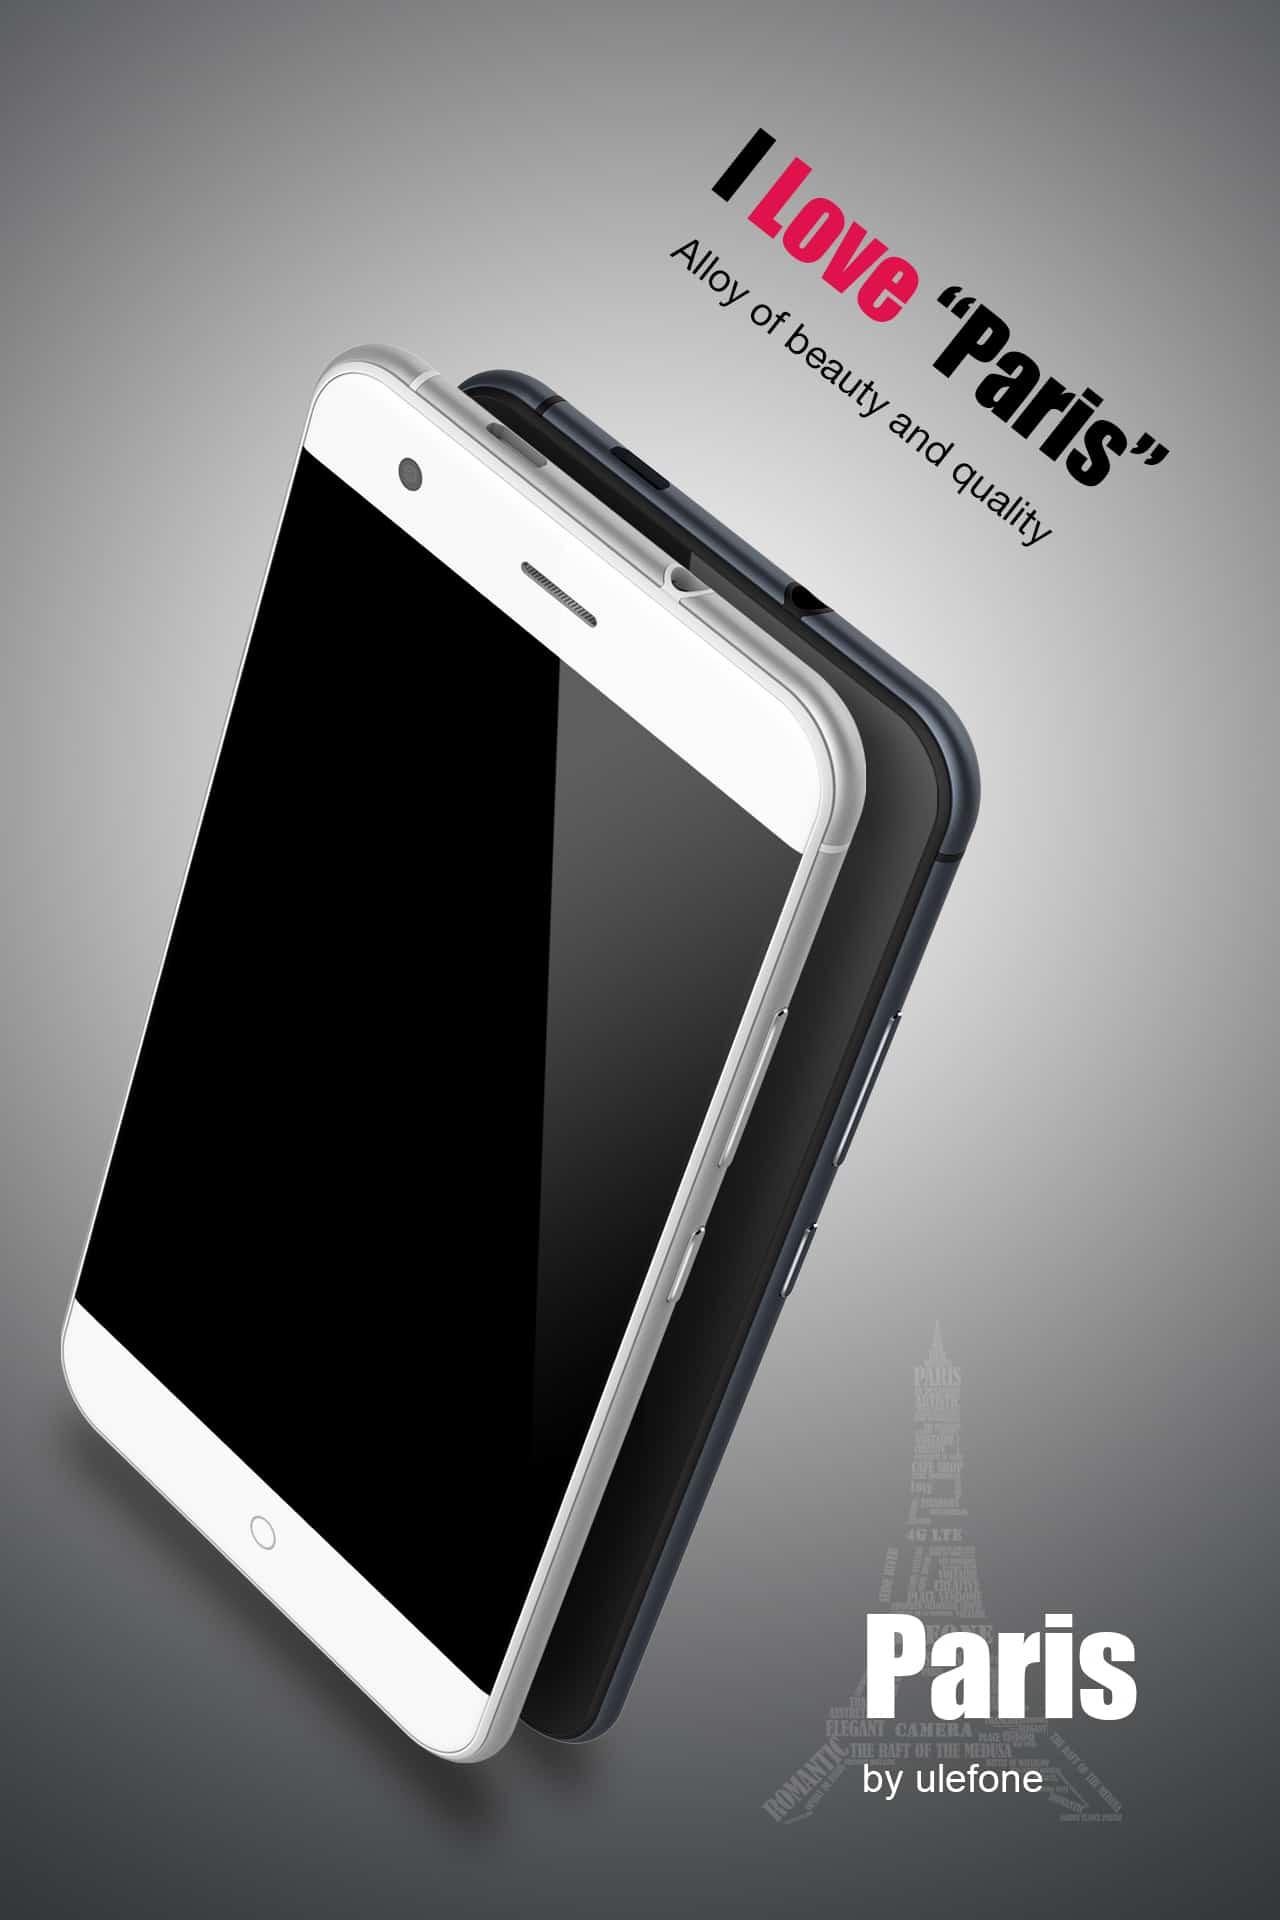 Ulefone Paris_2